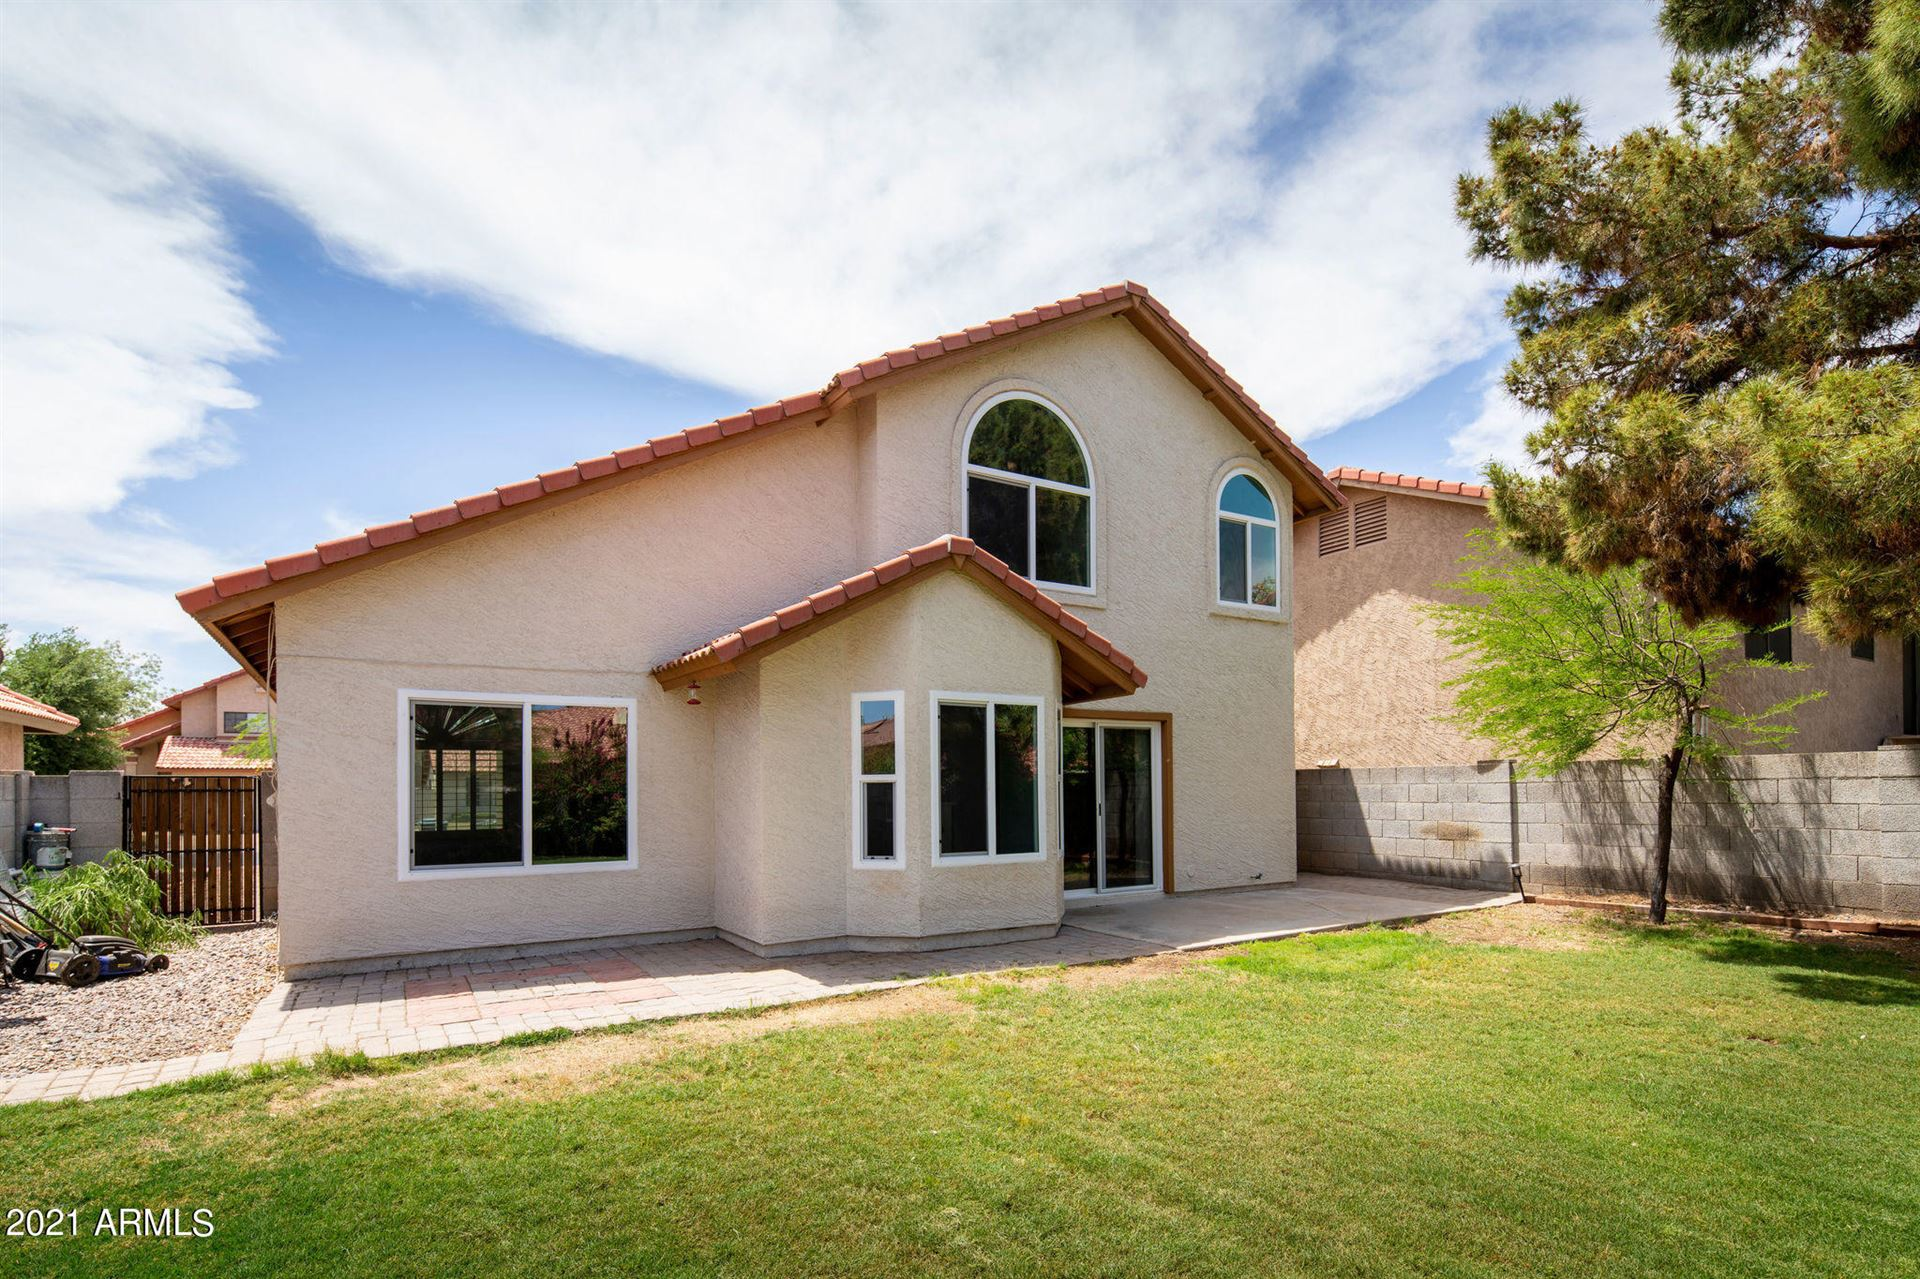 Photo of 1238 W SEASHORE Drive, Gilbert, AZ 85233 (MLS # 6232165)